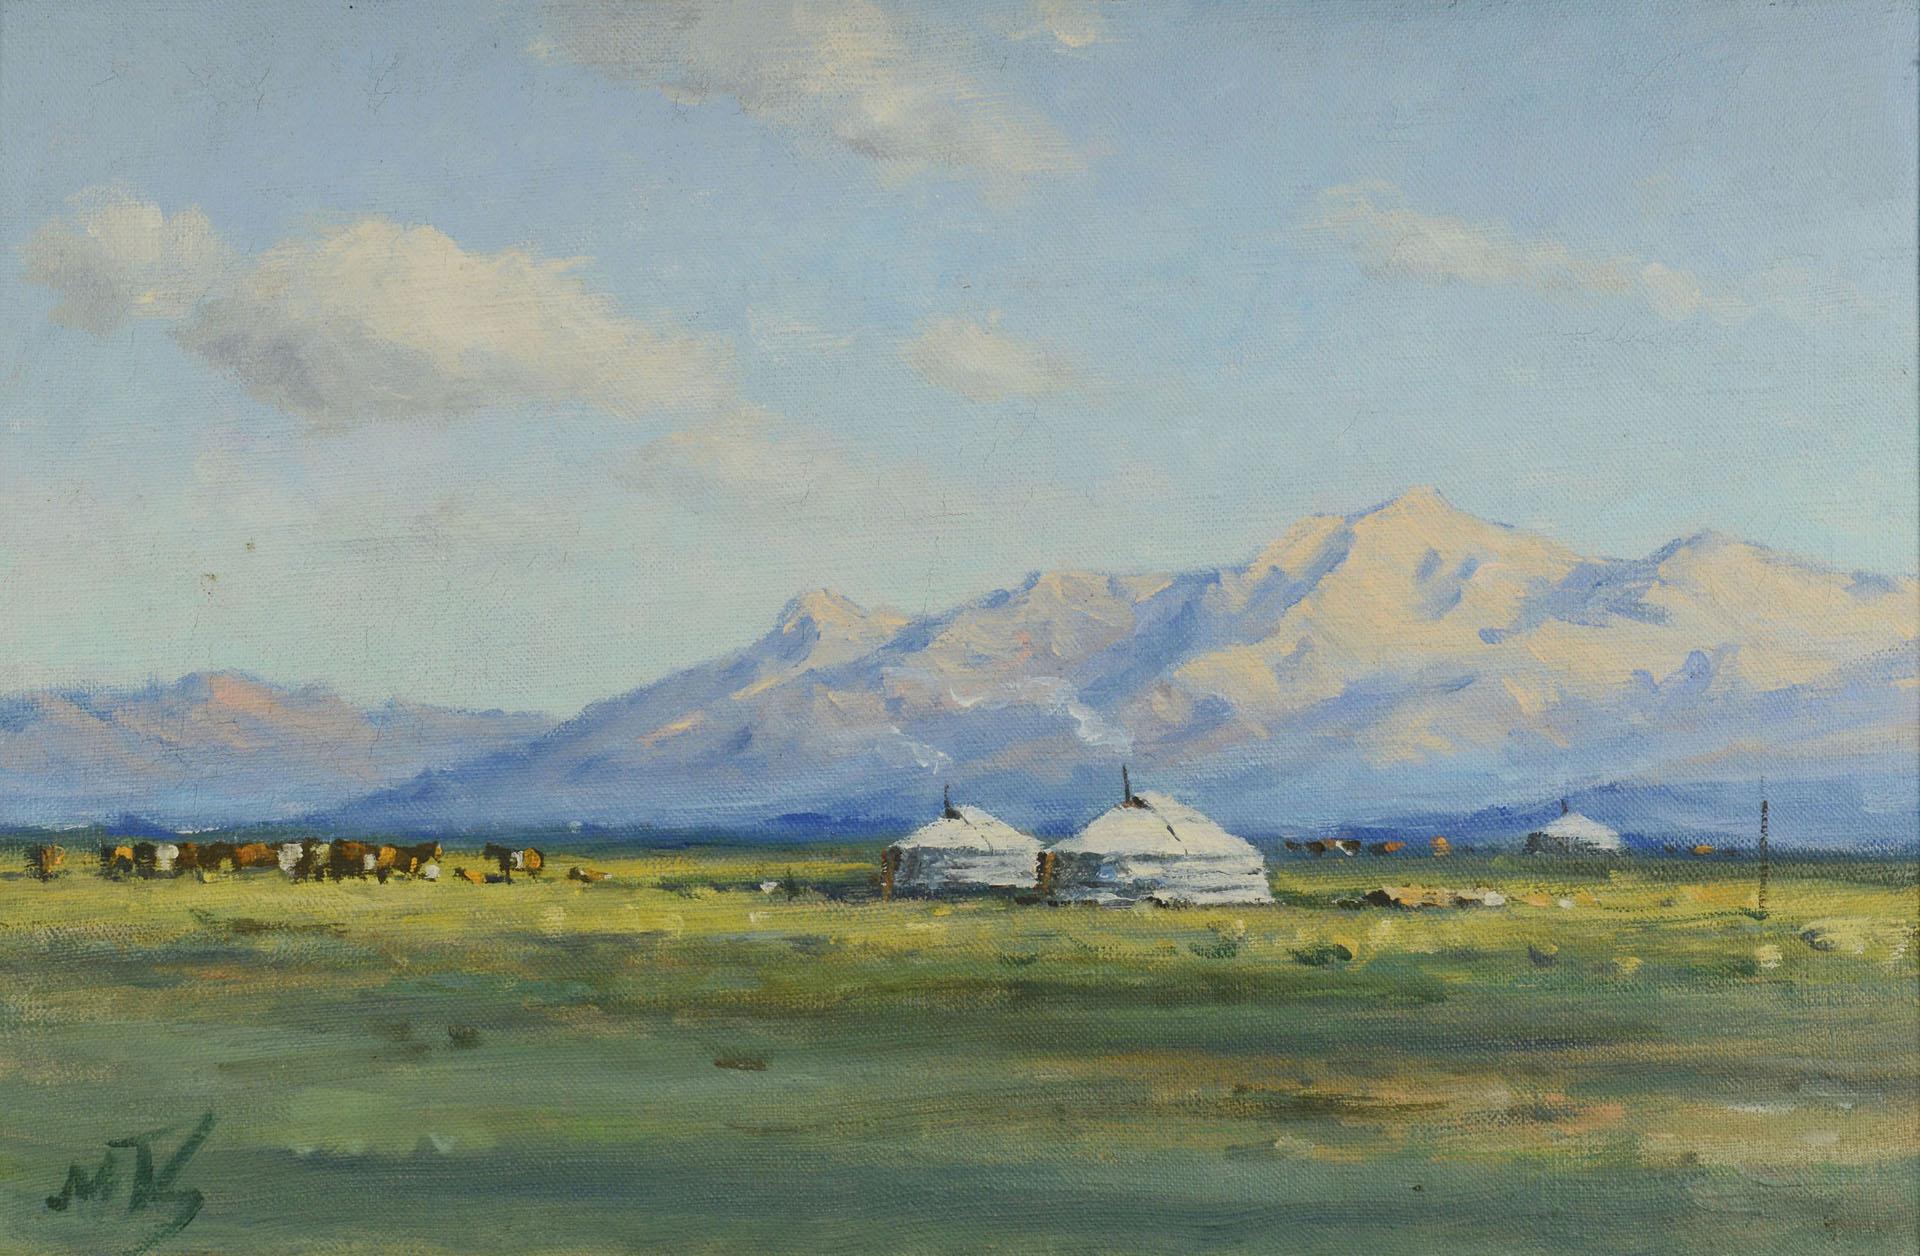 Lot 190 Southwestern Or Mongolian Landscape Painting